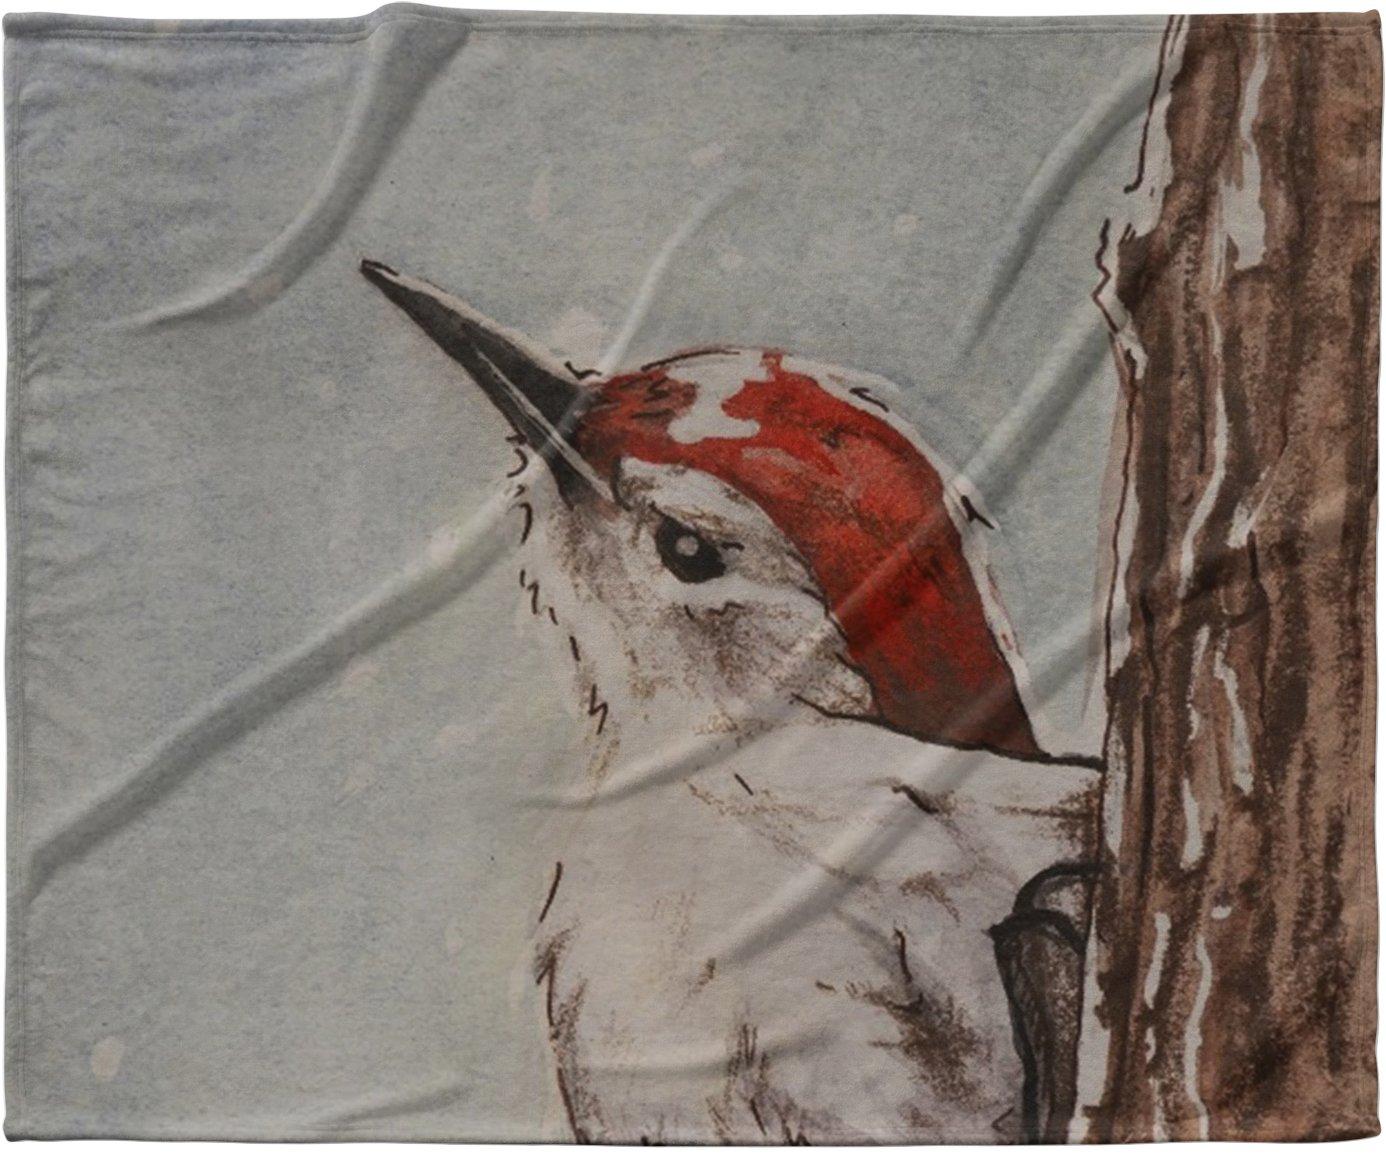 KESS InHouse Brittany Guarino ''Downy Woodpecker'' Fleece Baby Blanket, 40'' x 30''